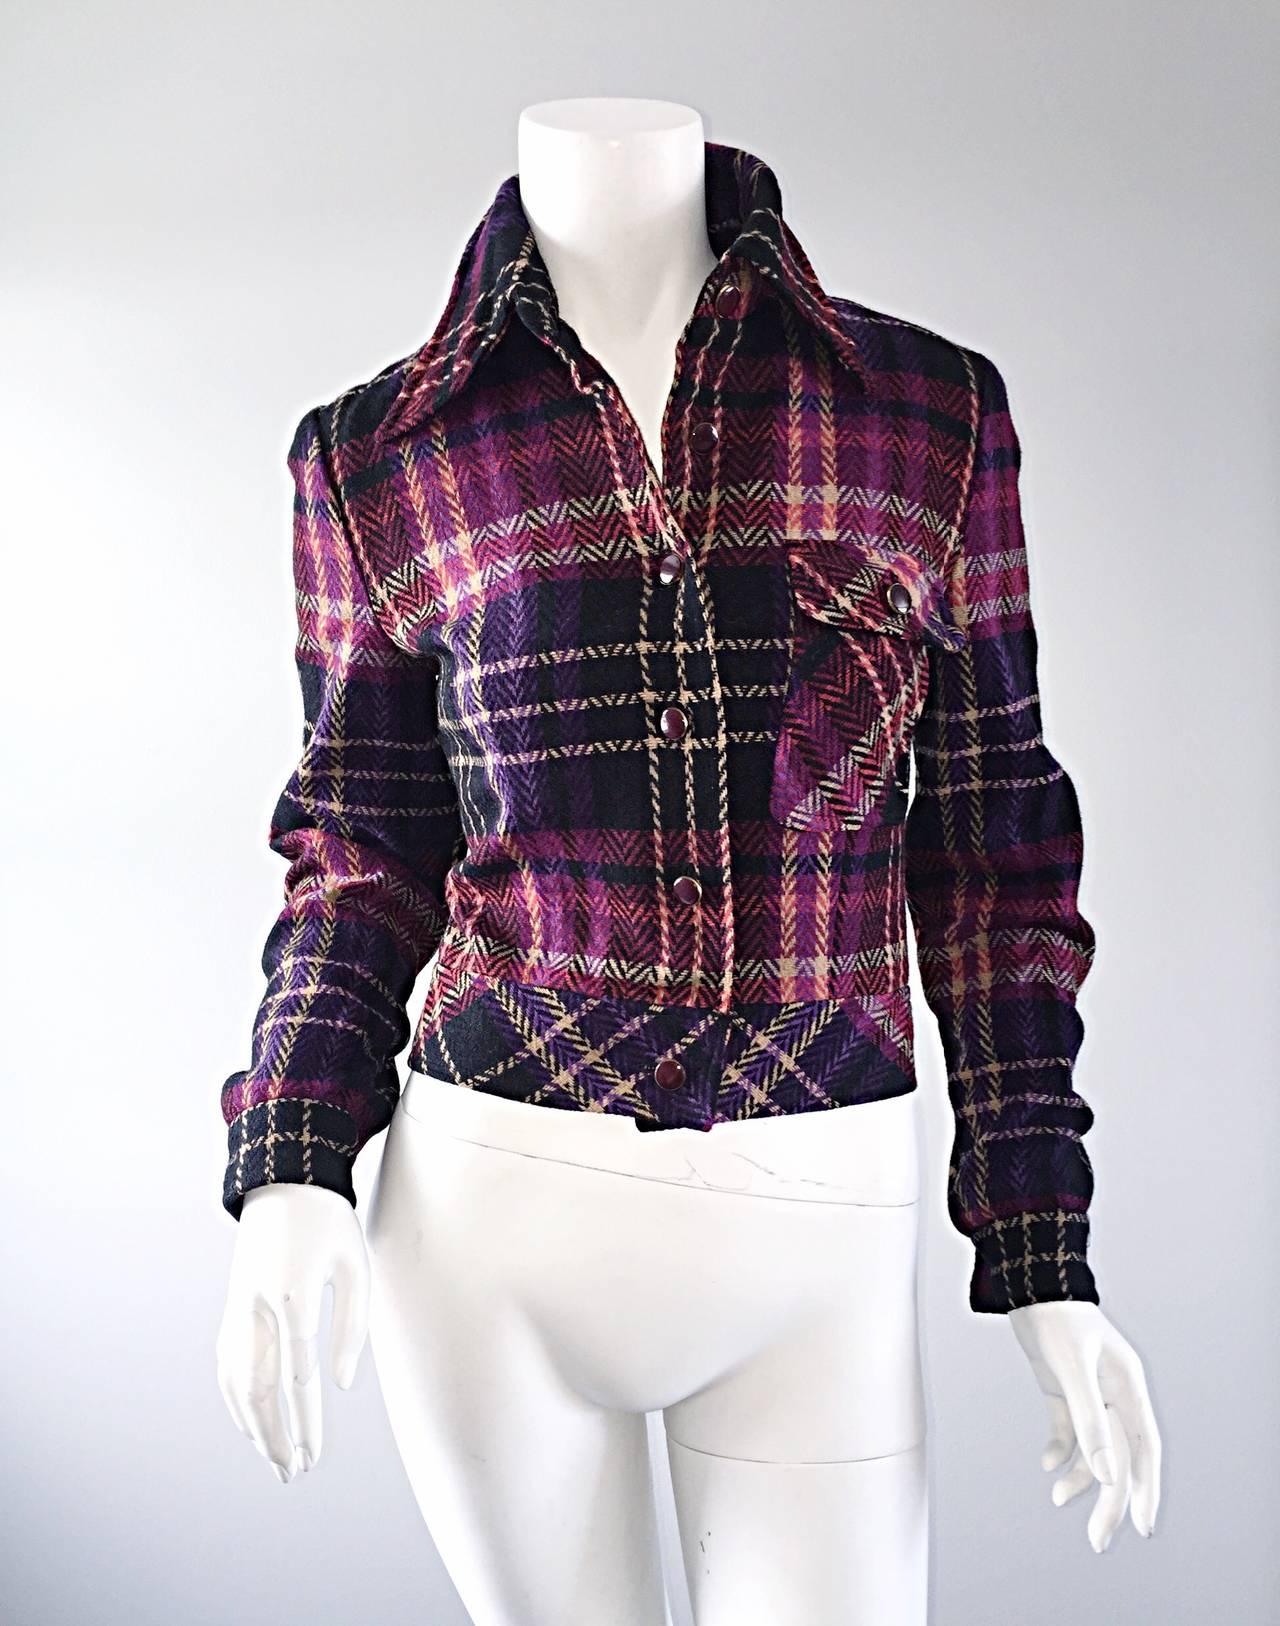 1970s Vintage Addena for I. Magnin Pink + Purple Plaid Herringbone Wool Jacket 3